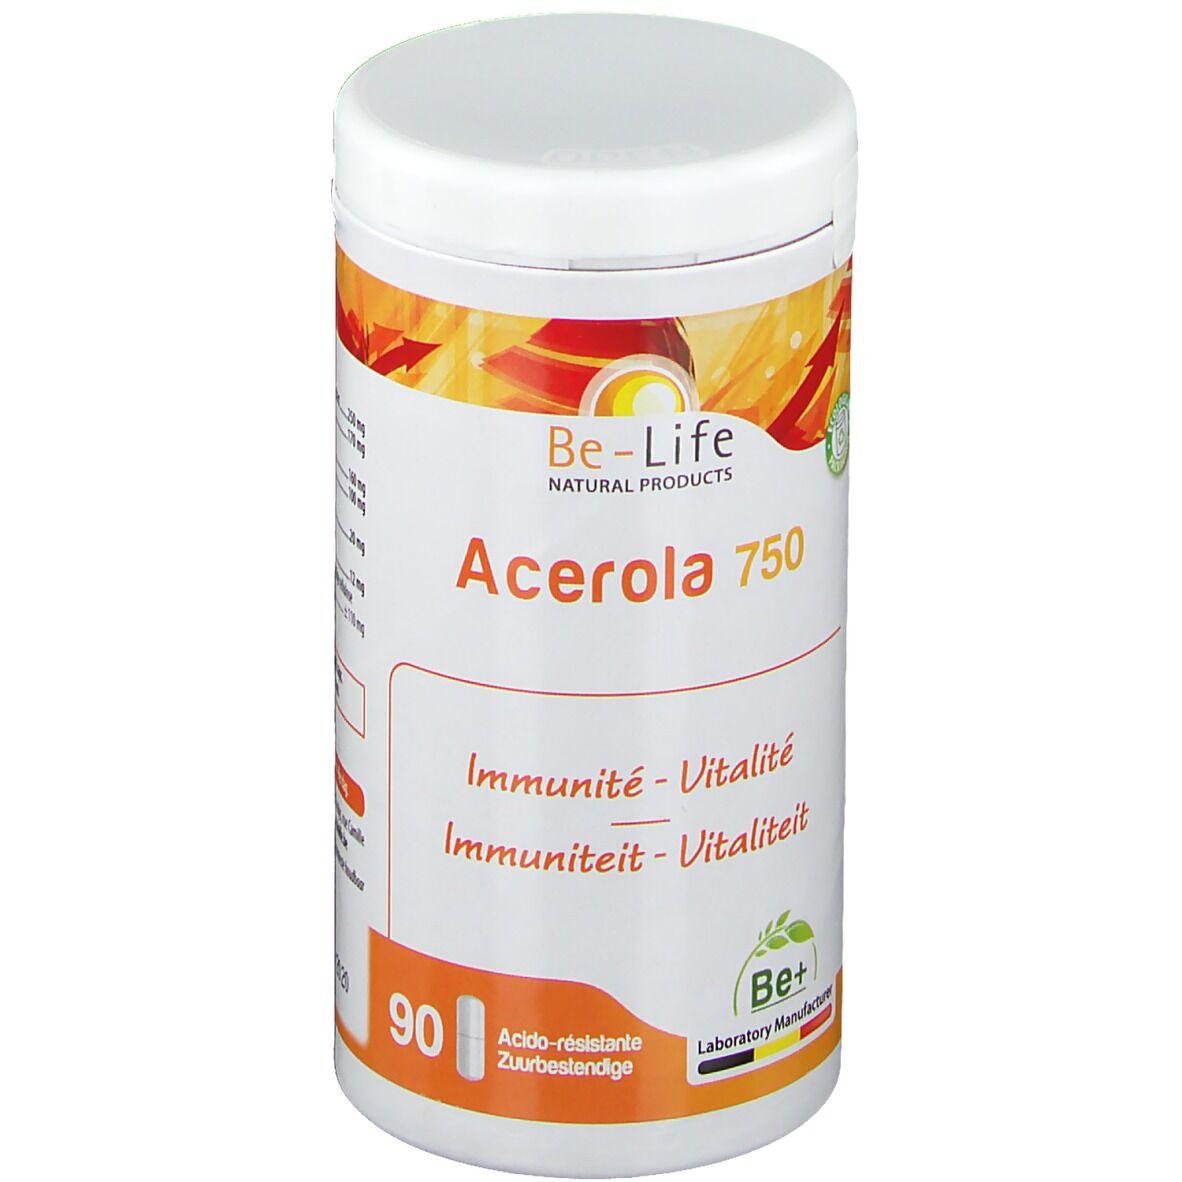 BIOLife Be-Life Acerola 750Mg pc(s) capsule(s)